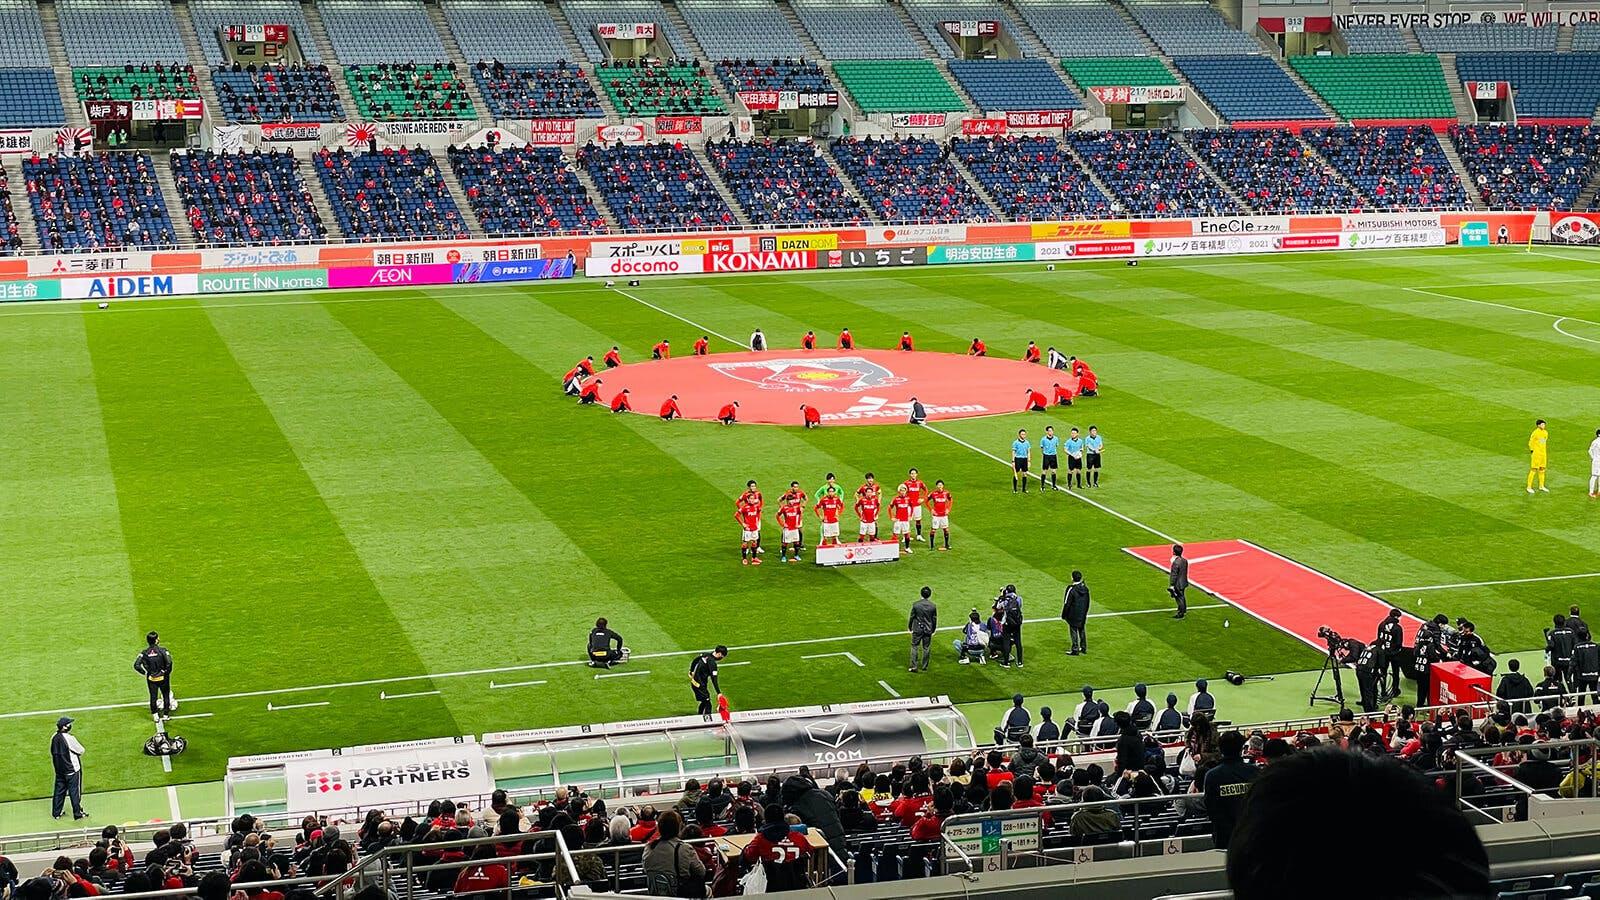 2021 Jリーグ 第5節 埼玉スタジアム2002 北海道コンサドーレ札幌戦